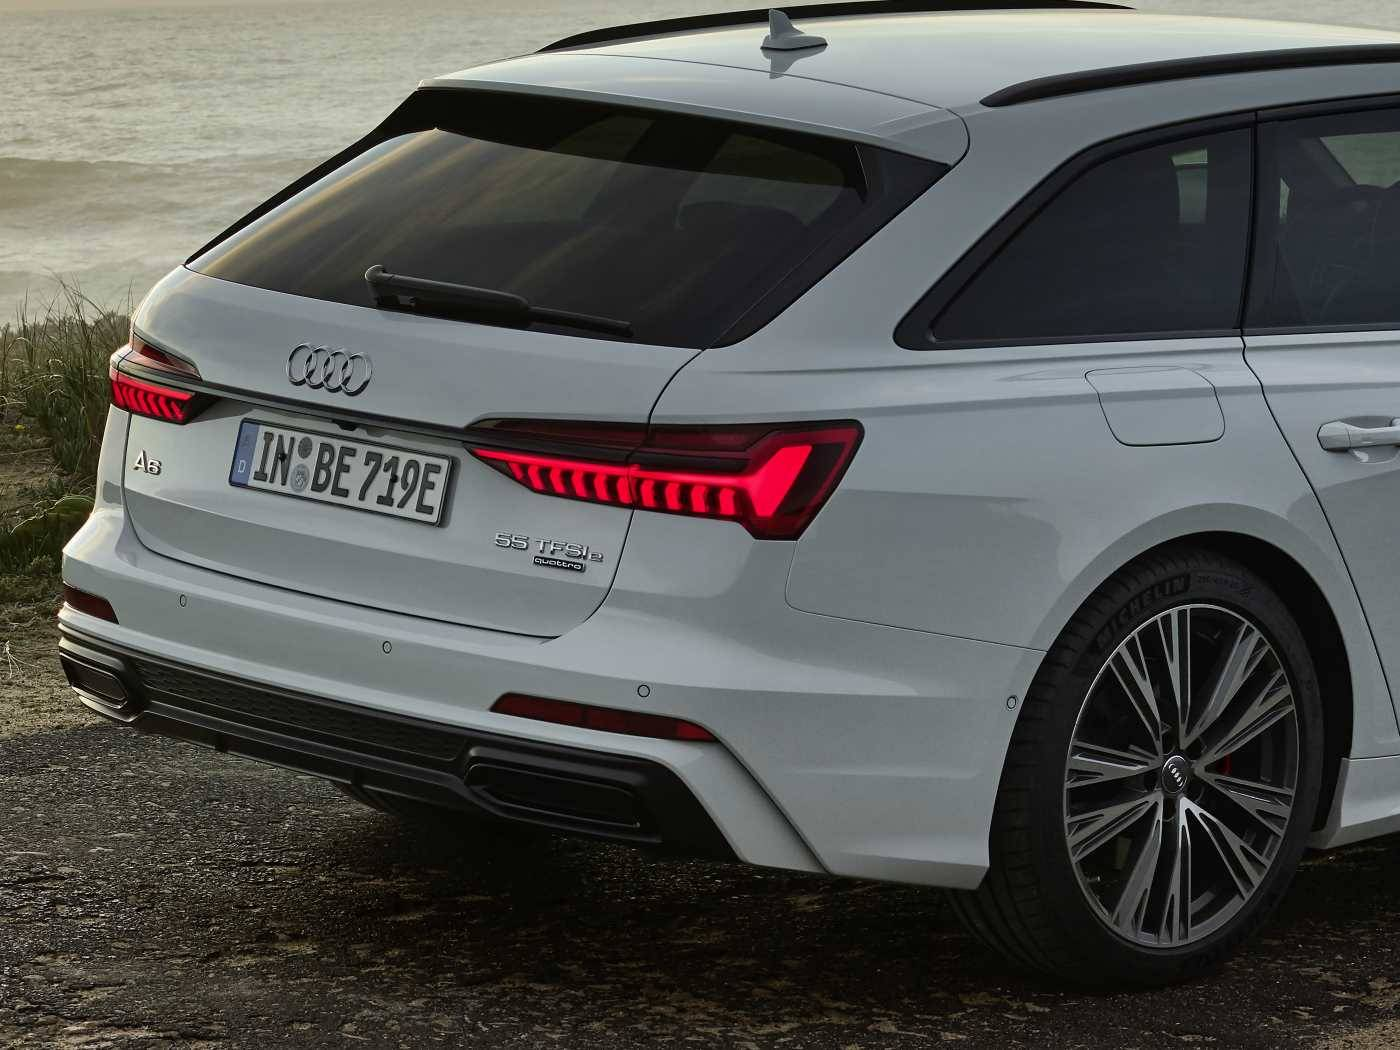 Audi A6 Avant hybride TFSIe prix 2021 phares led